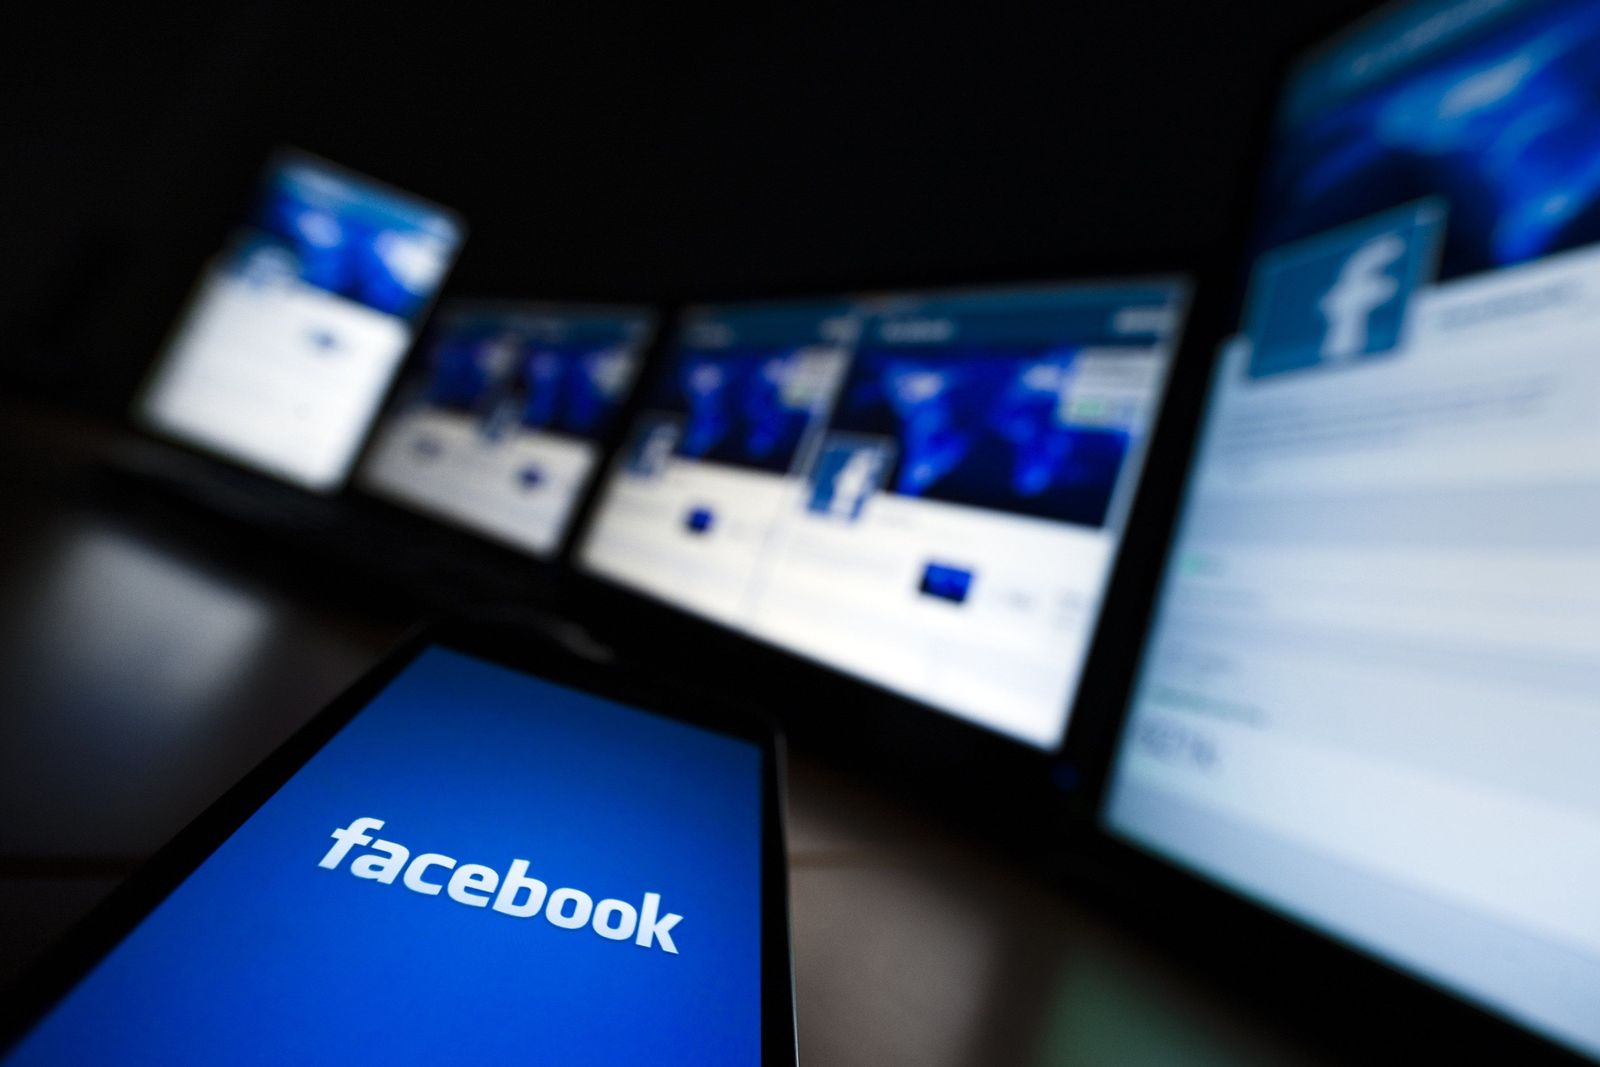 Facebook Logo / Handy